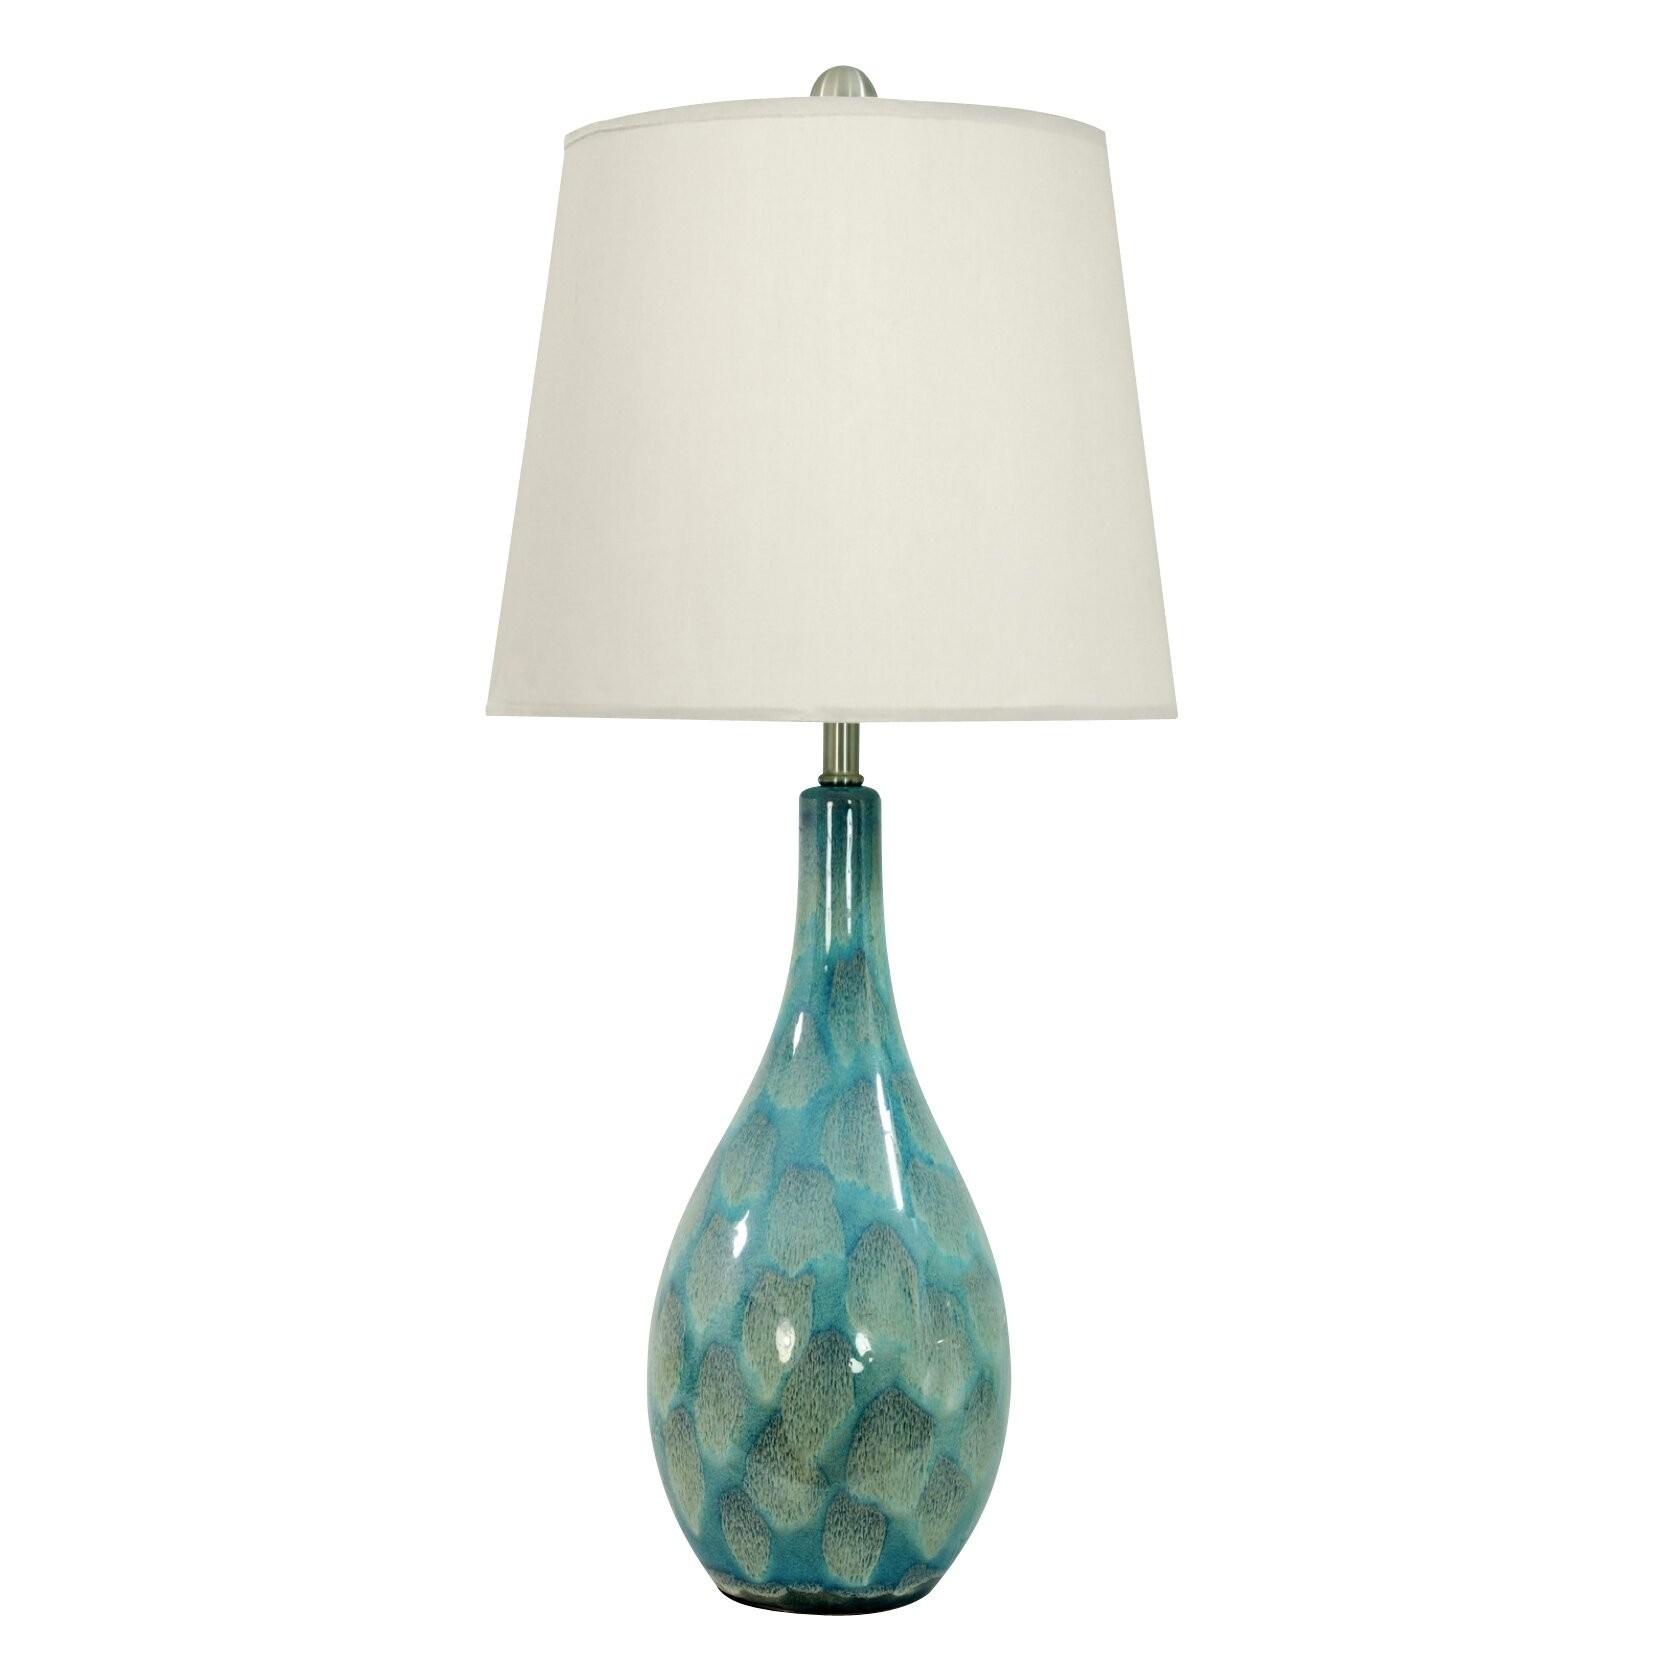 J Hunt Table Lamps